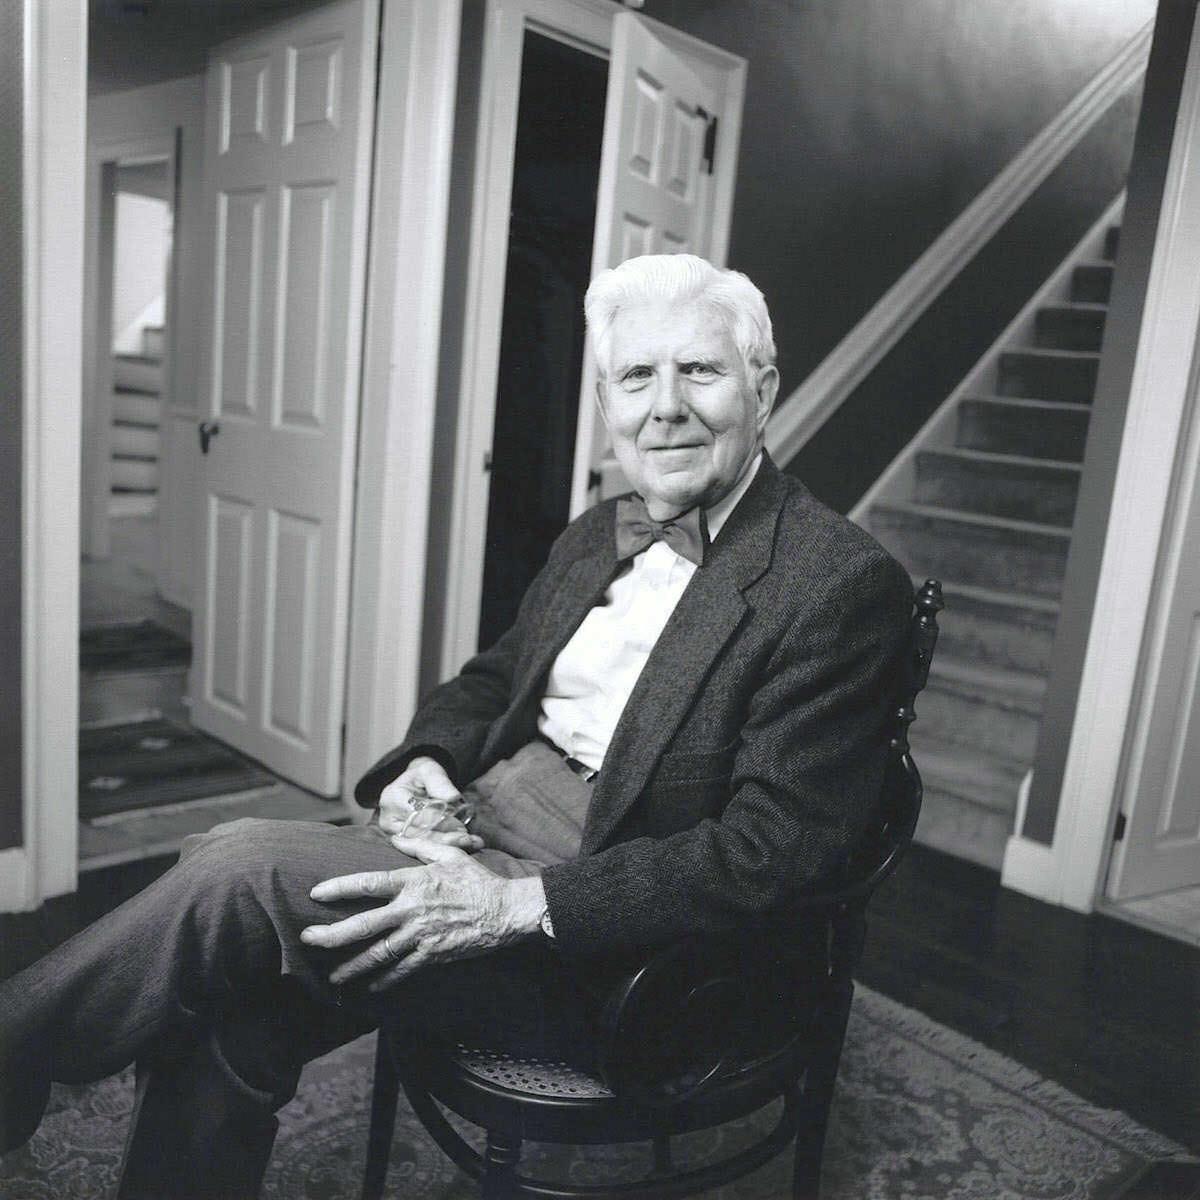 El psiquiatra Aaron T. Beck está considerado como el padre de la terapia cognitiva, a menudo empleada en el contexto del síndrome de Asperger.